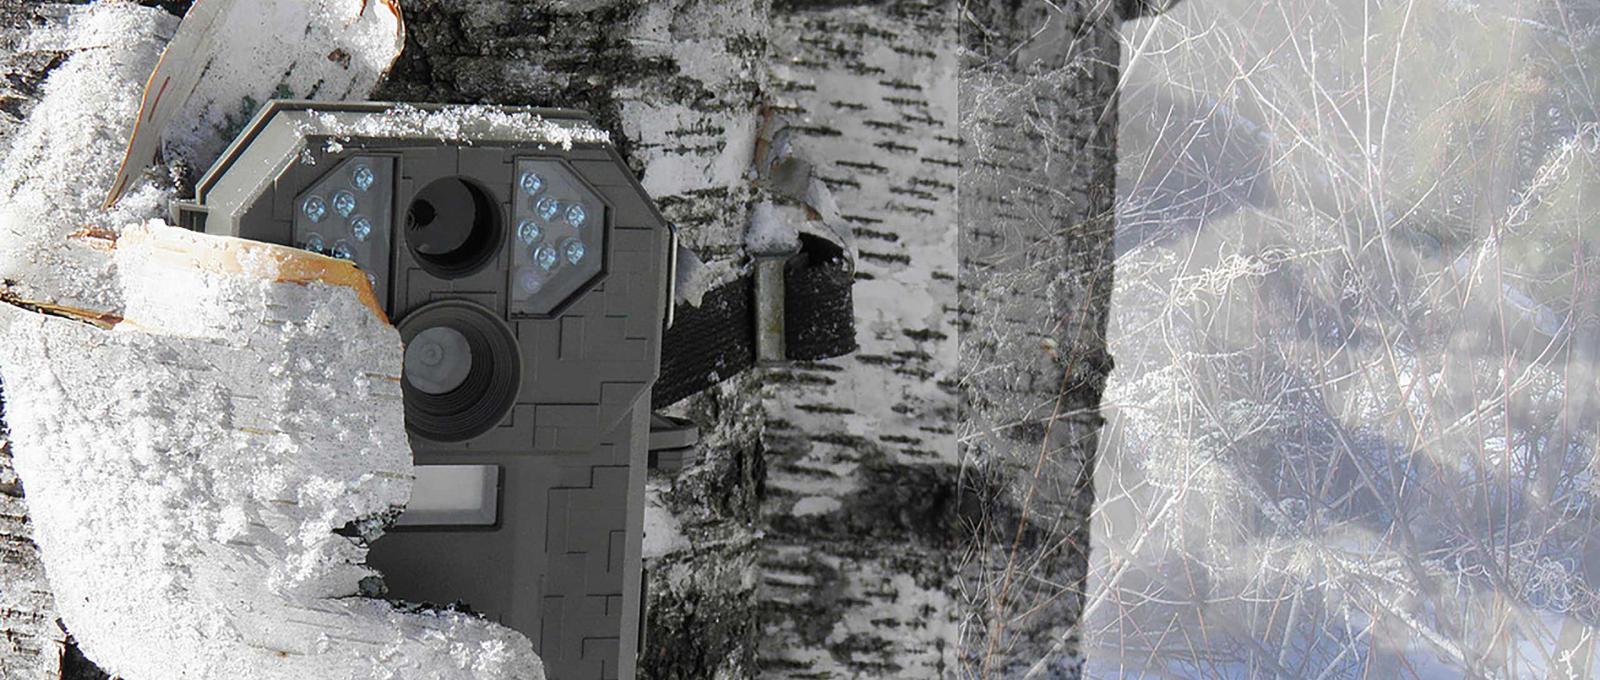 Surveillance camera hidden in a tree